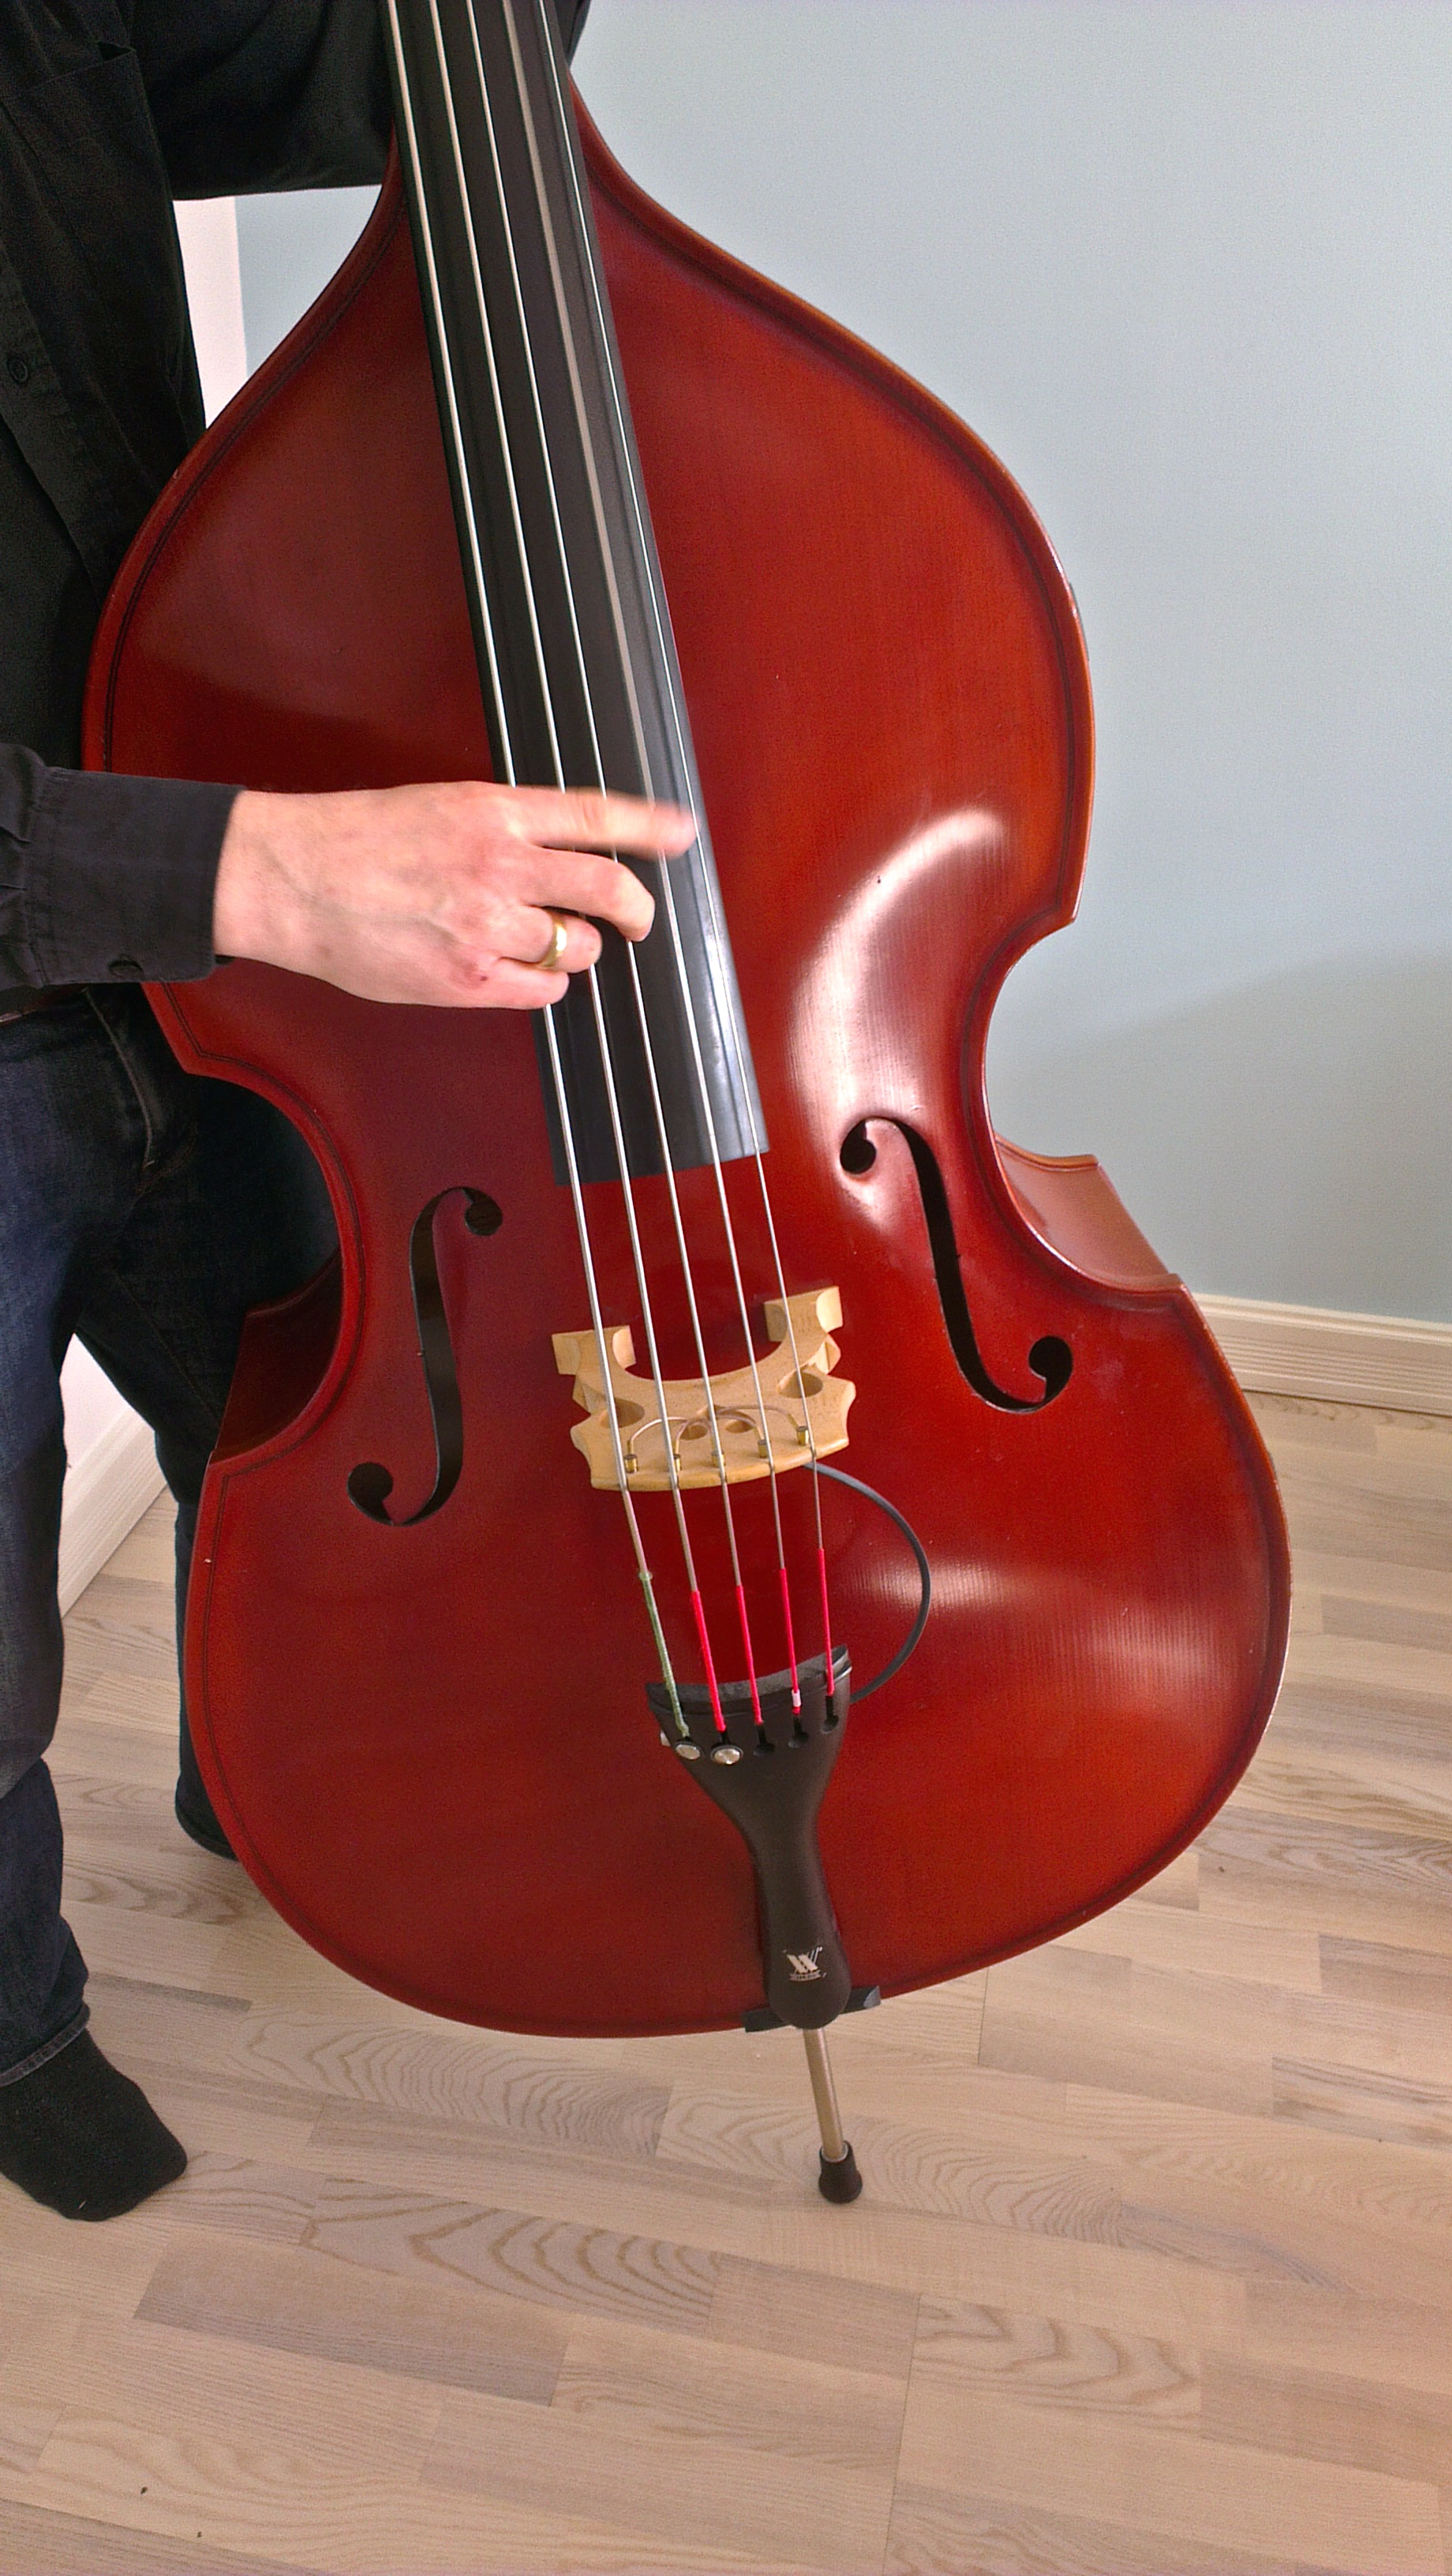 gunnar damsgaard 5 string 3 4 double bass 1995 bass for sale. Black Bedroom Furniture Sets. Home Design Ideas